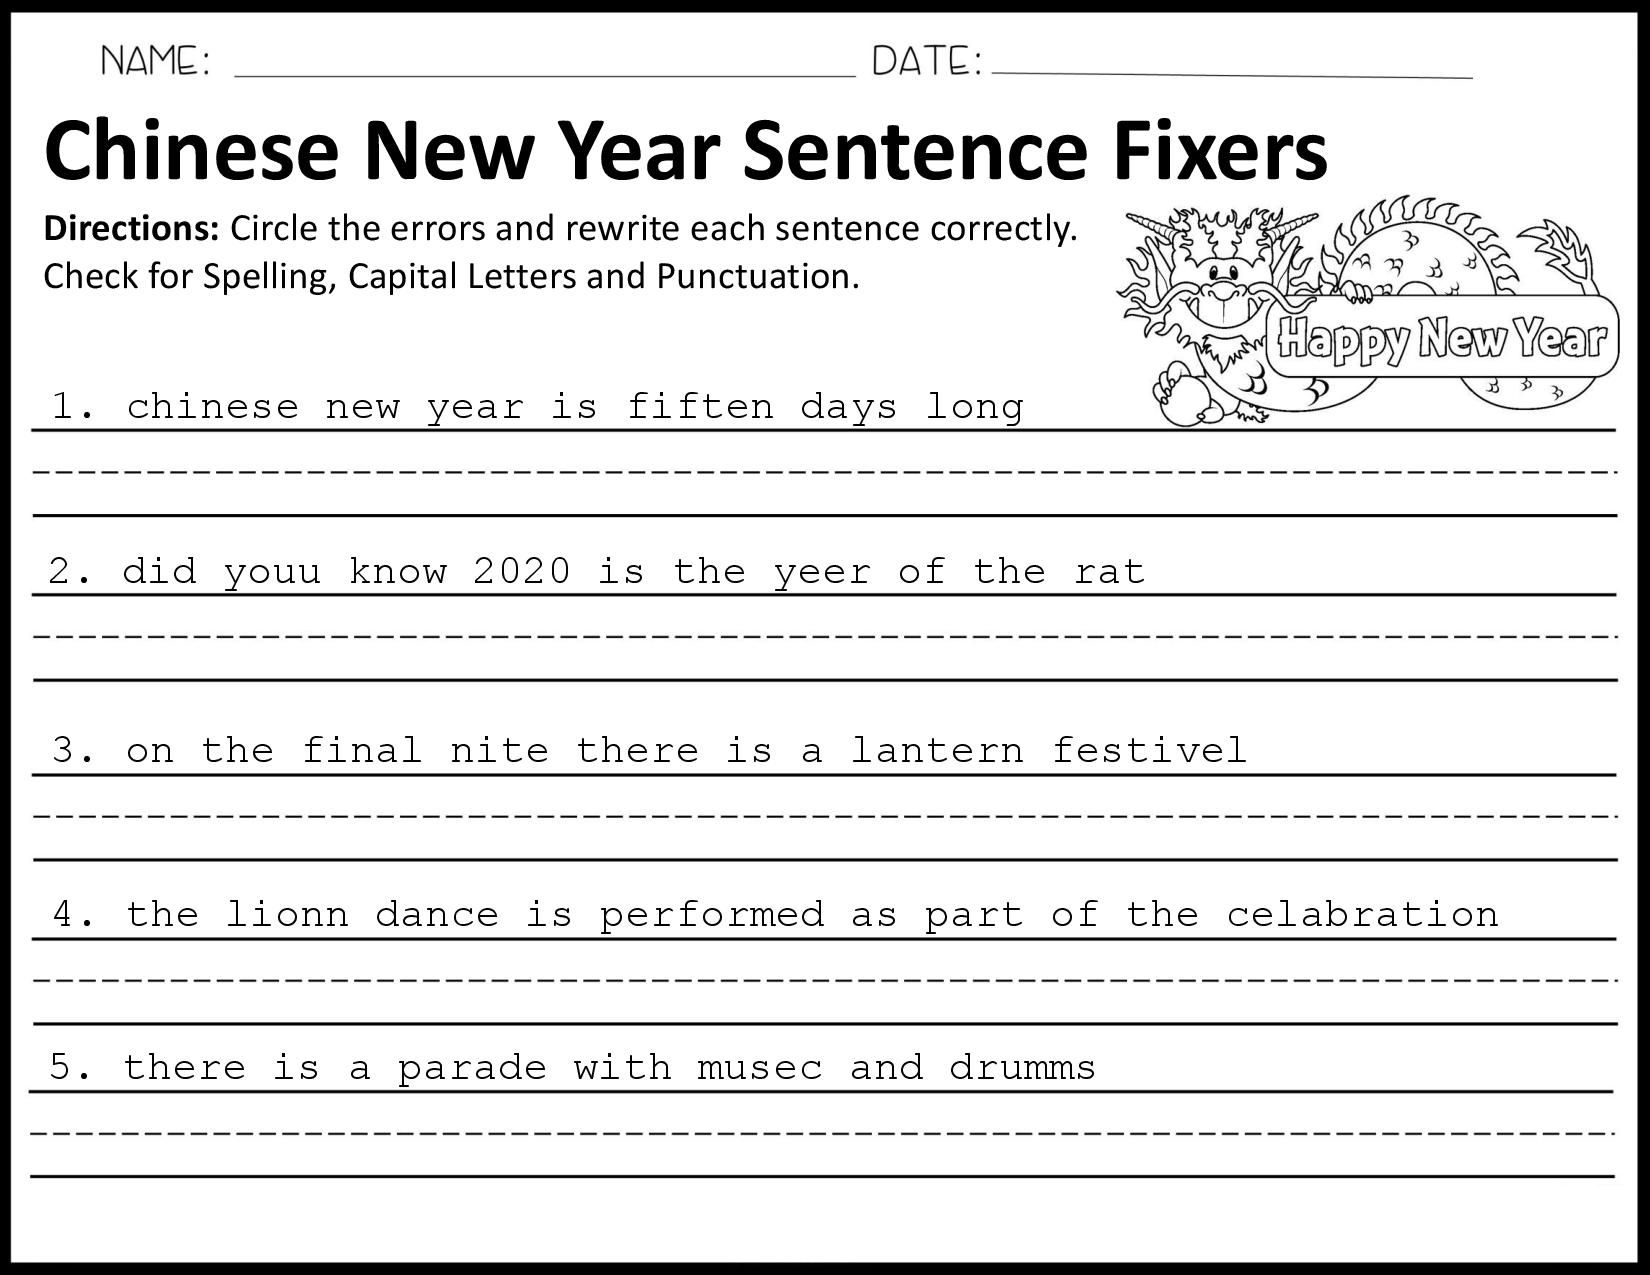 Chinese New Year Sentence Fixers